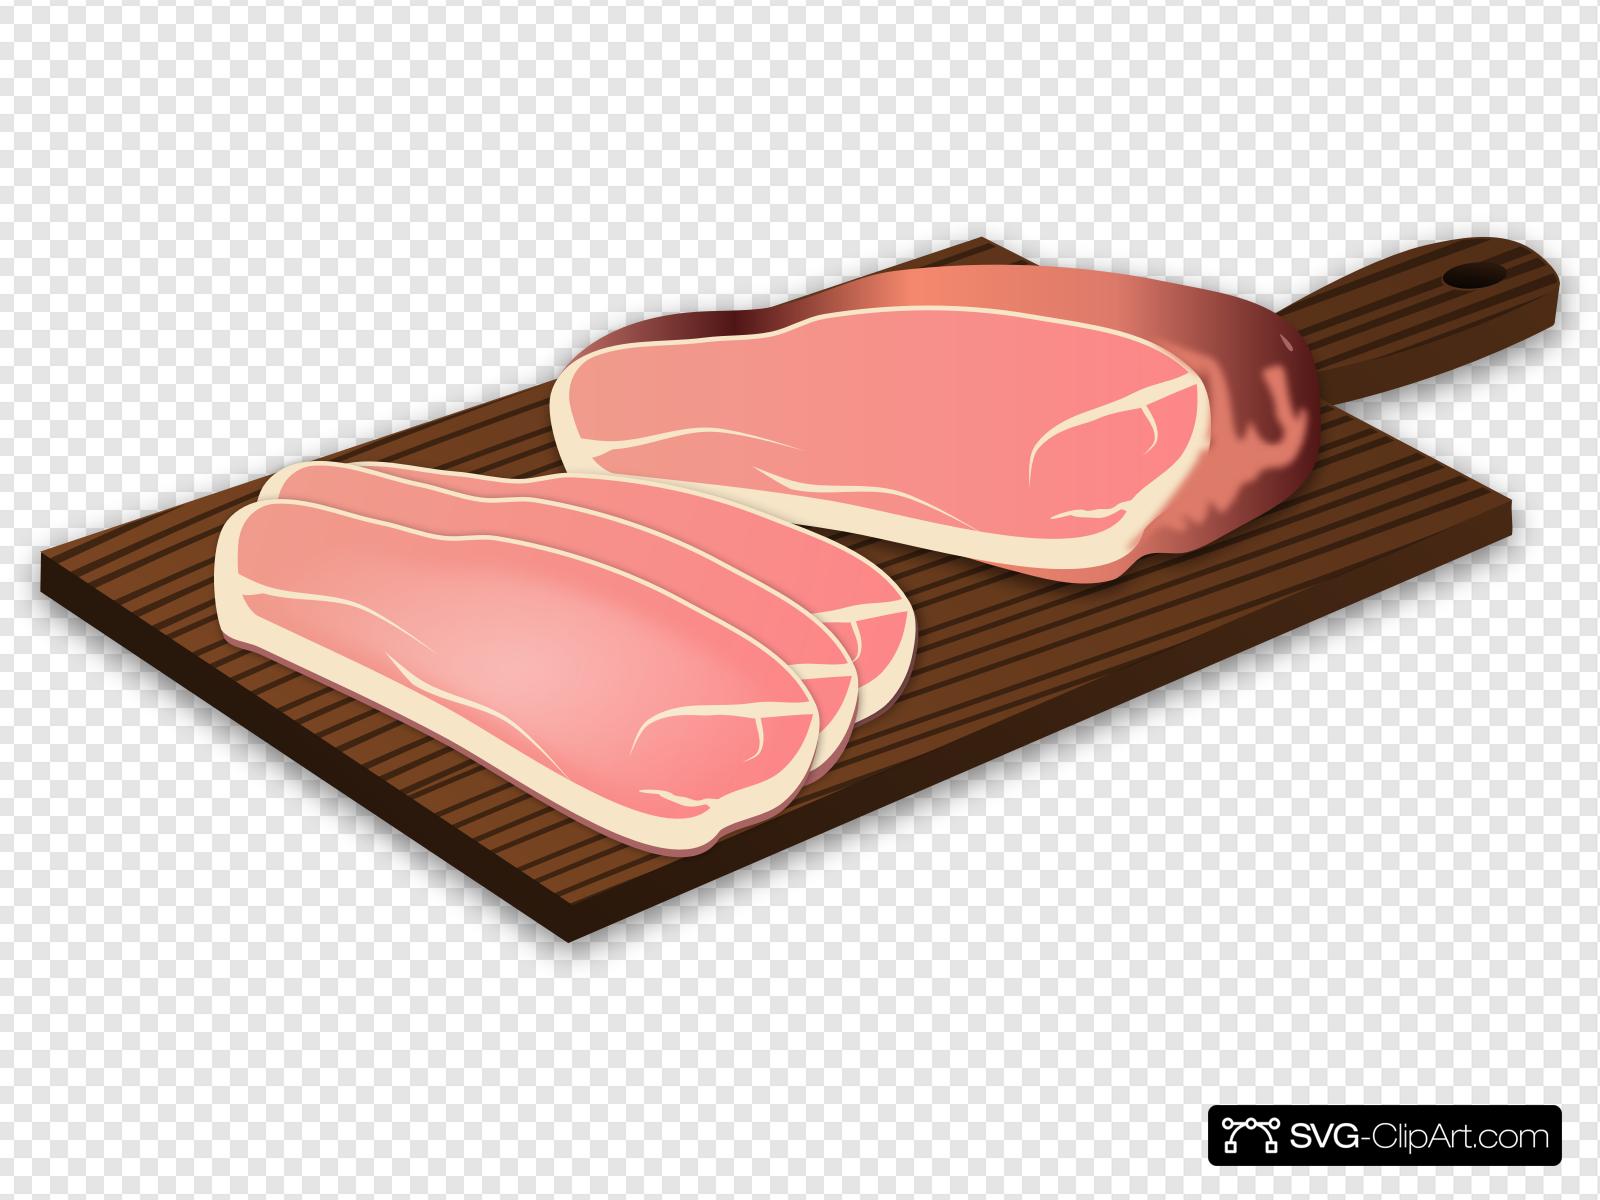 Sliced Ham Clip art, Icon and SVG.